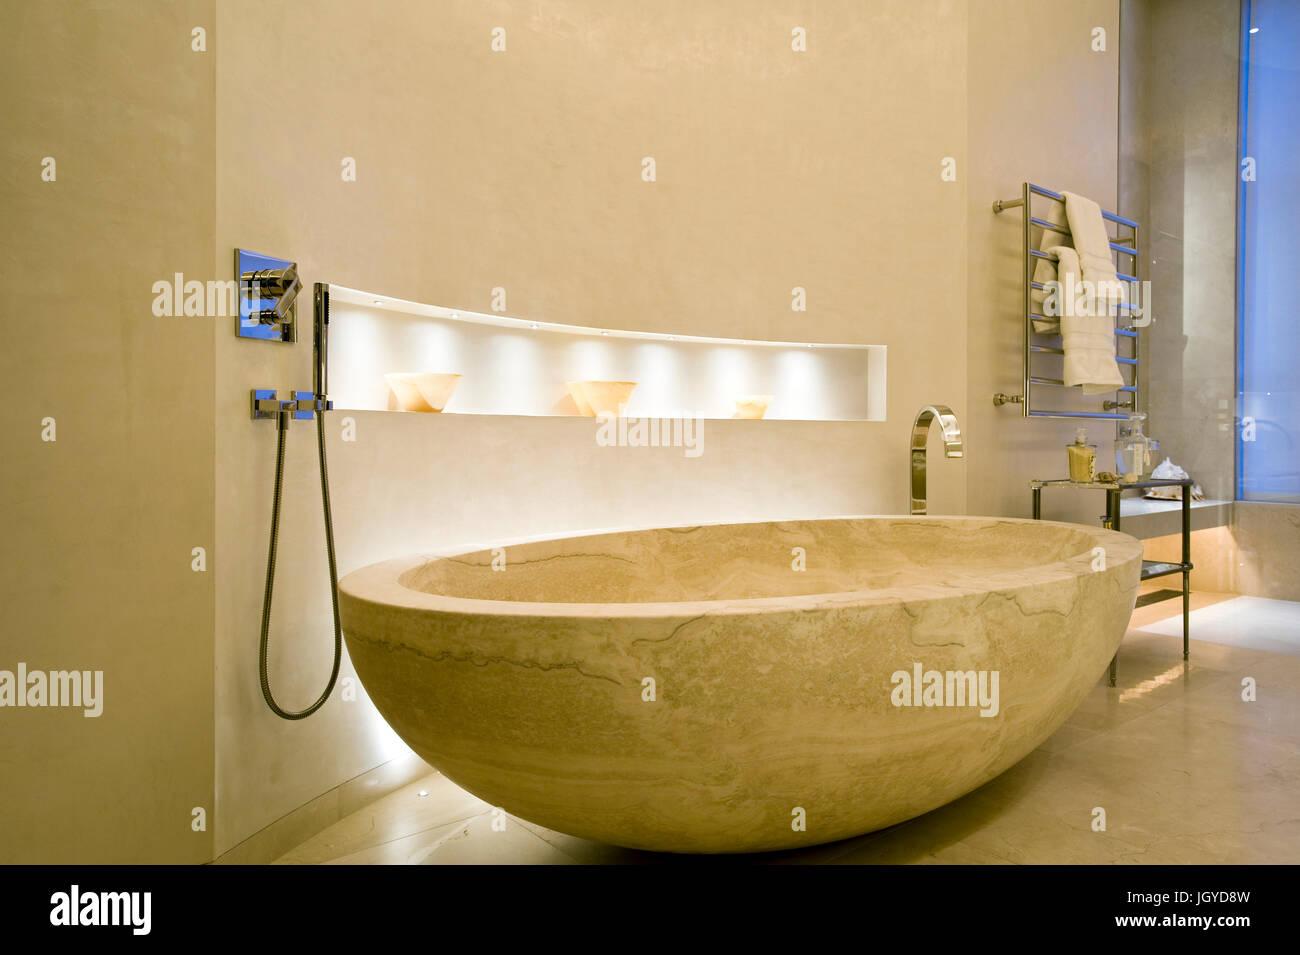 Vasca Da Bagno Pietra : Vasca da bagno in pietra di notte foto immagine stock